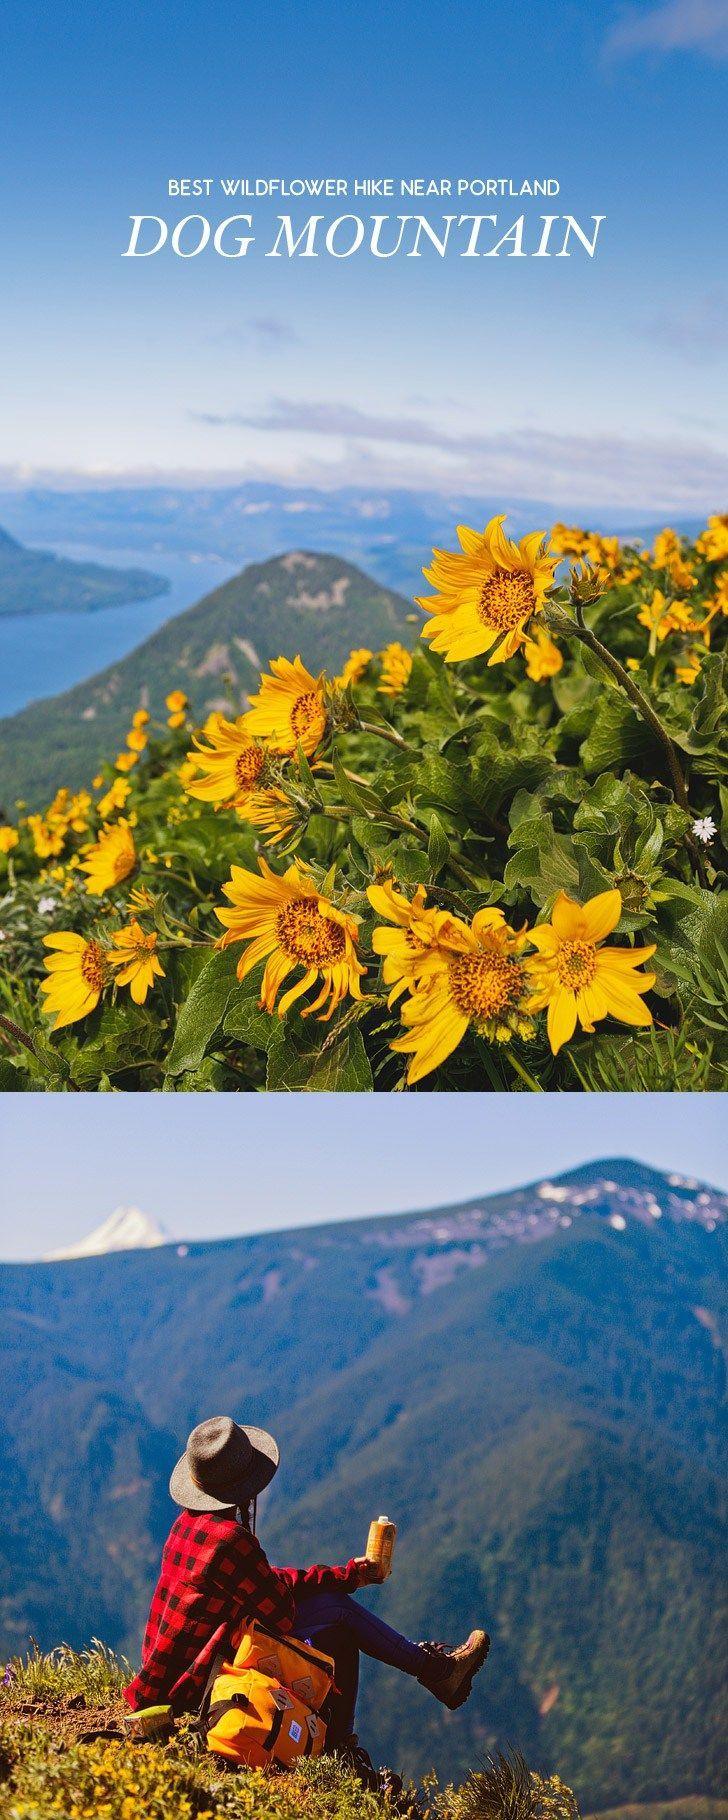 The Best Wildflower Hike Near Portland - Dog Mountain Trail, Columbia River Gorge, Washington // localadventurer.com